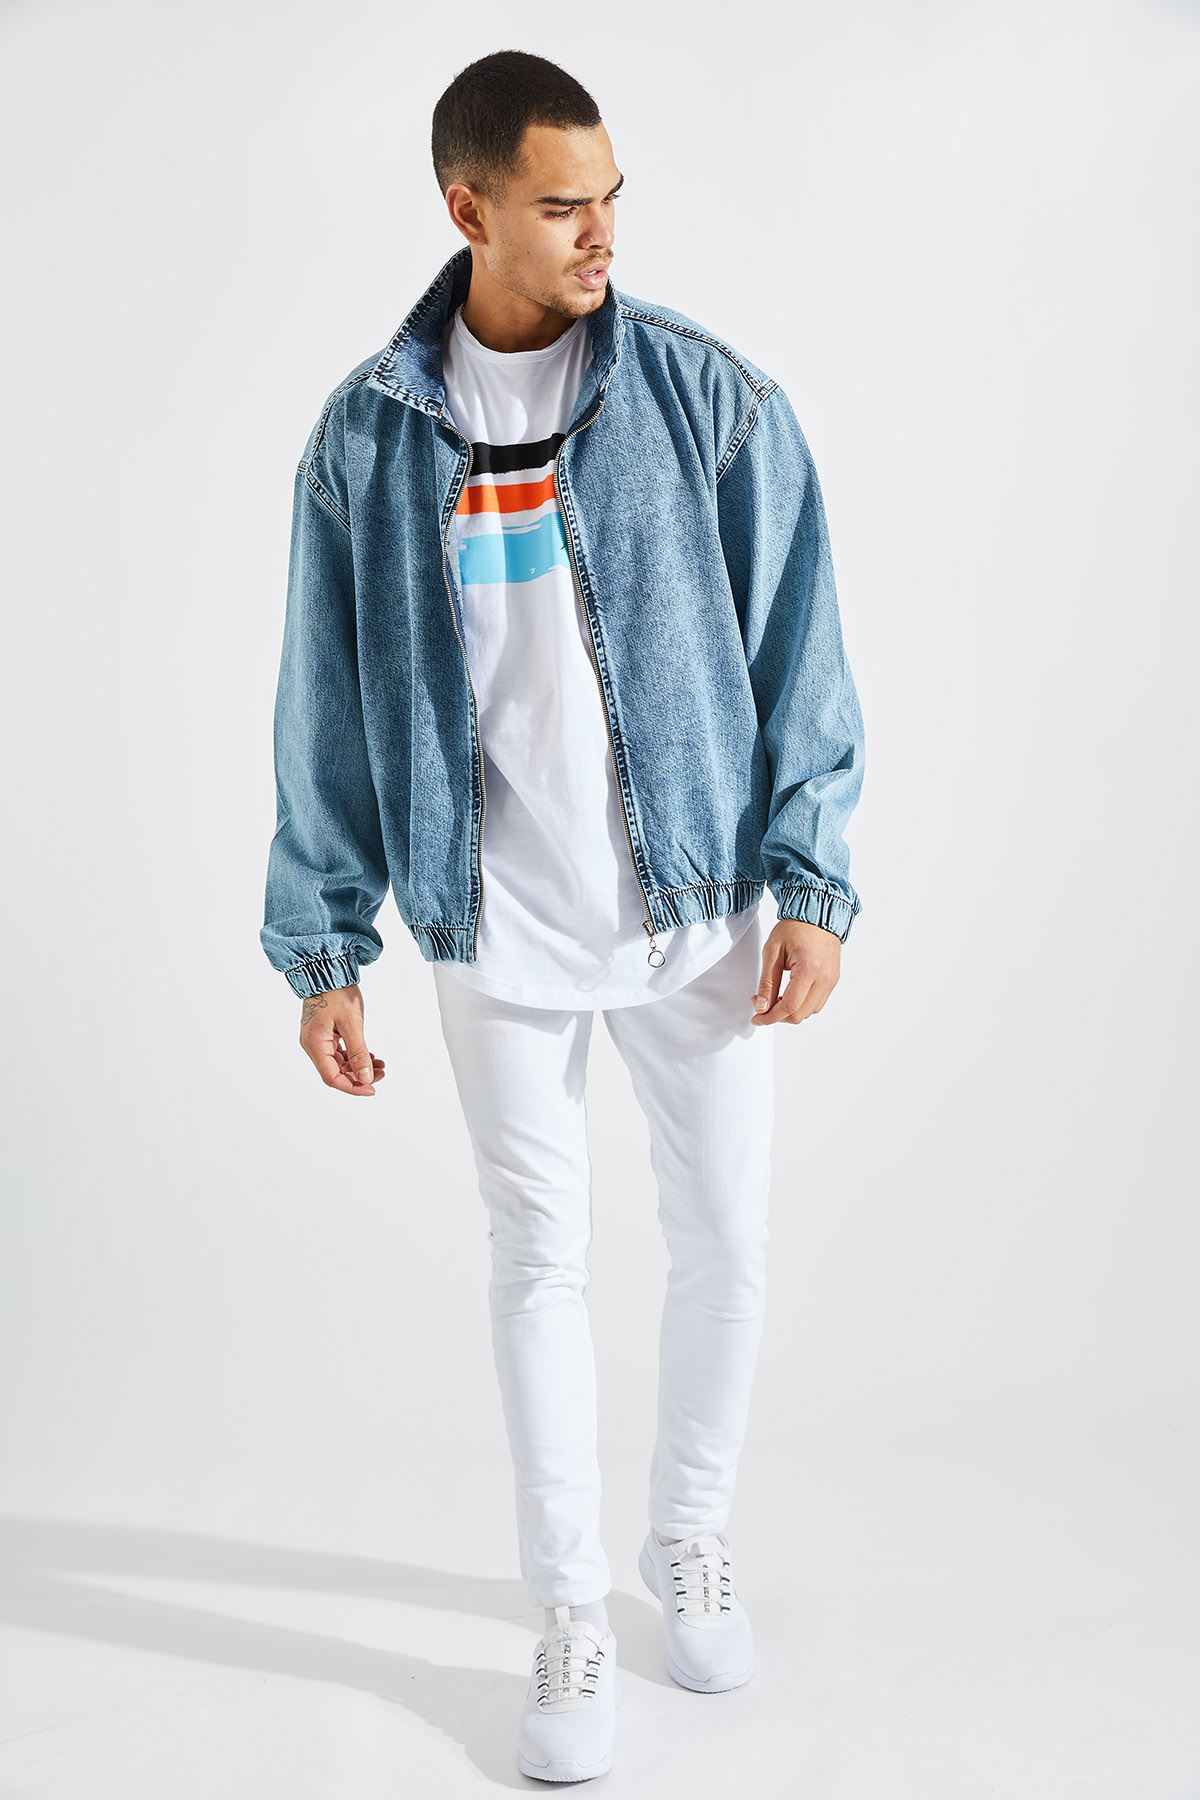 Erkek Oversize Açık Mavi Kot Mont